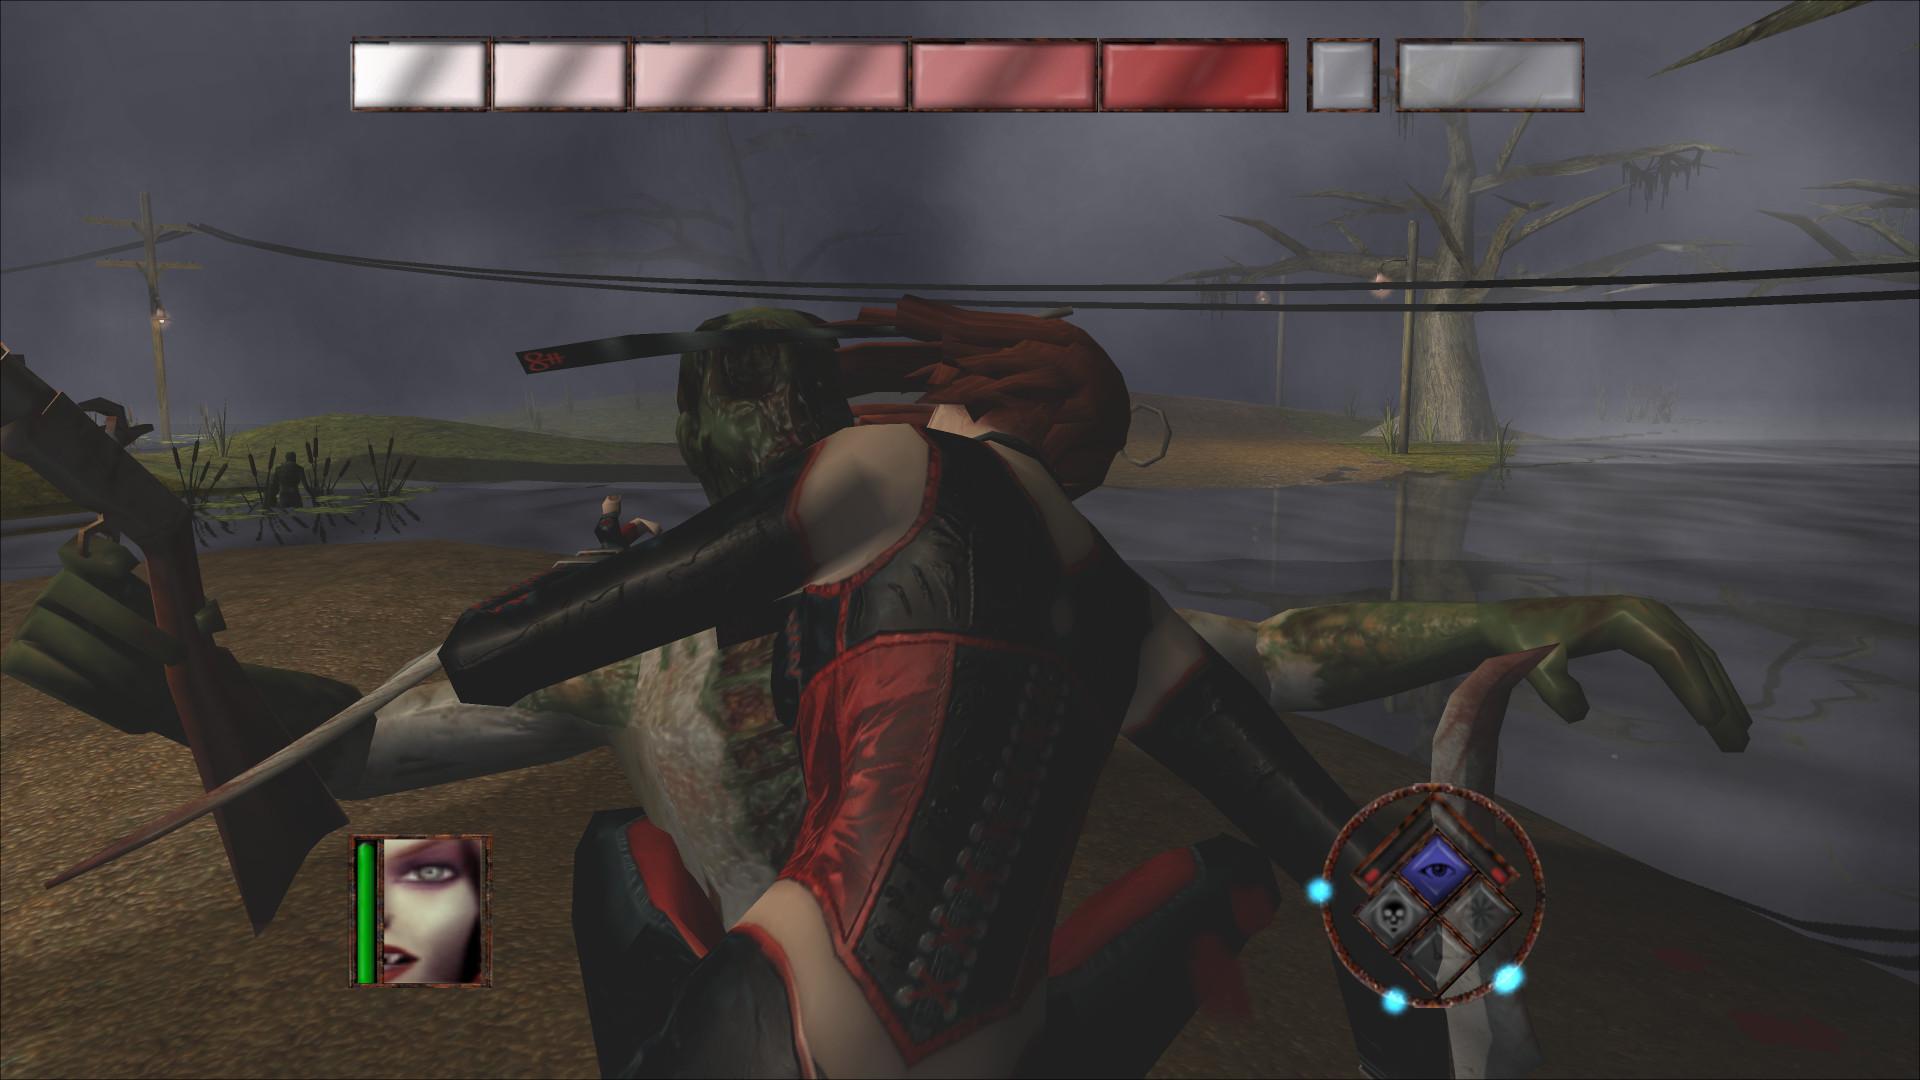 bloodrayne-terminal-cut-pc-screenshot-02